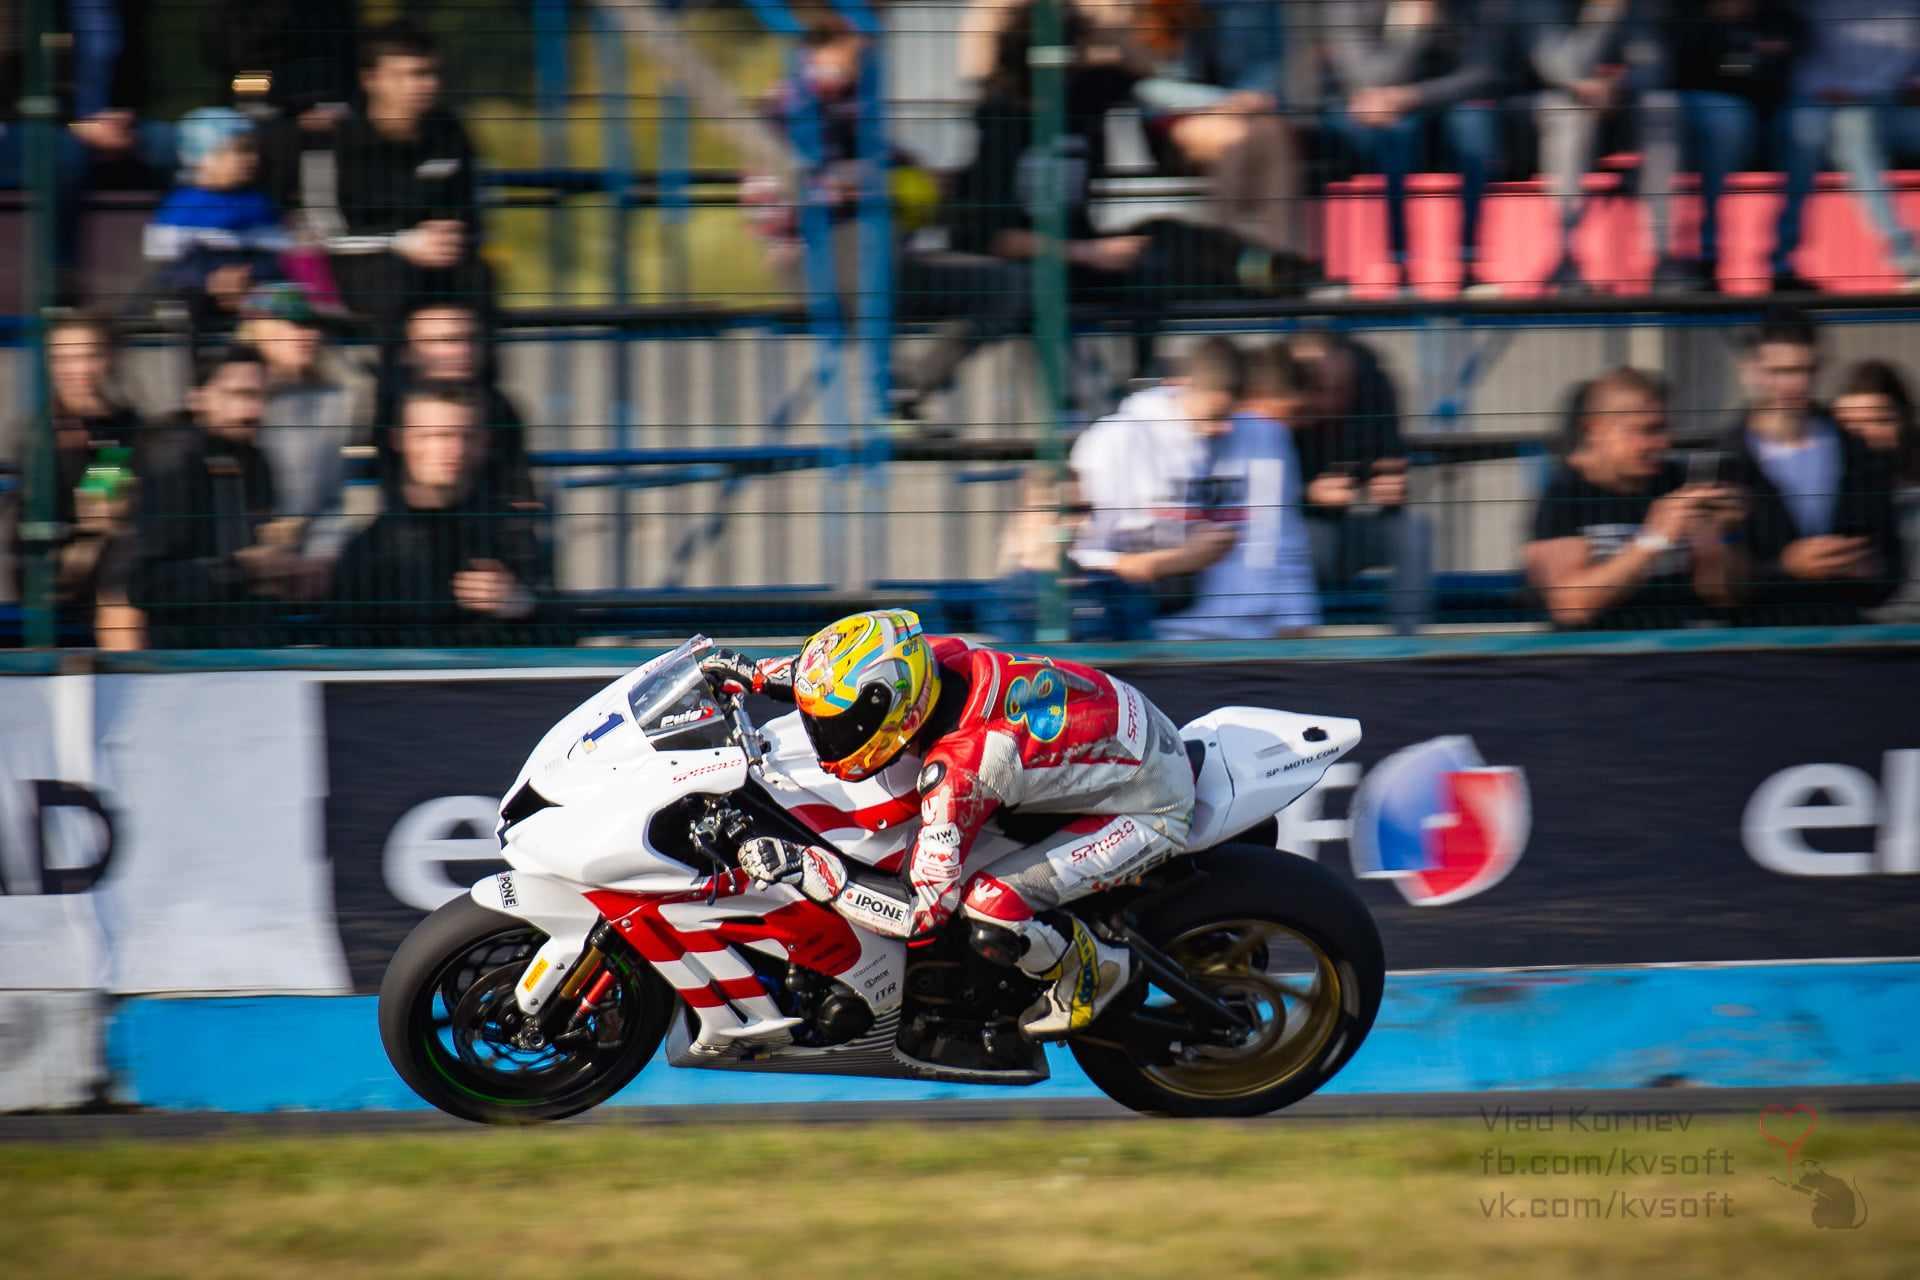 5-6_etap_MotoGPUkraine_075